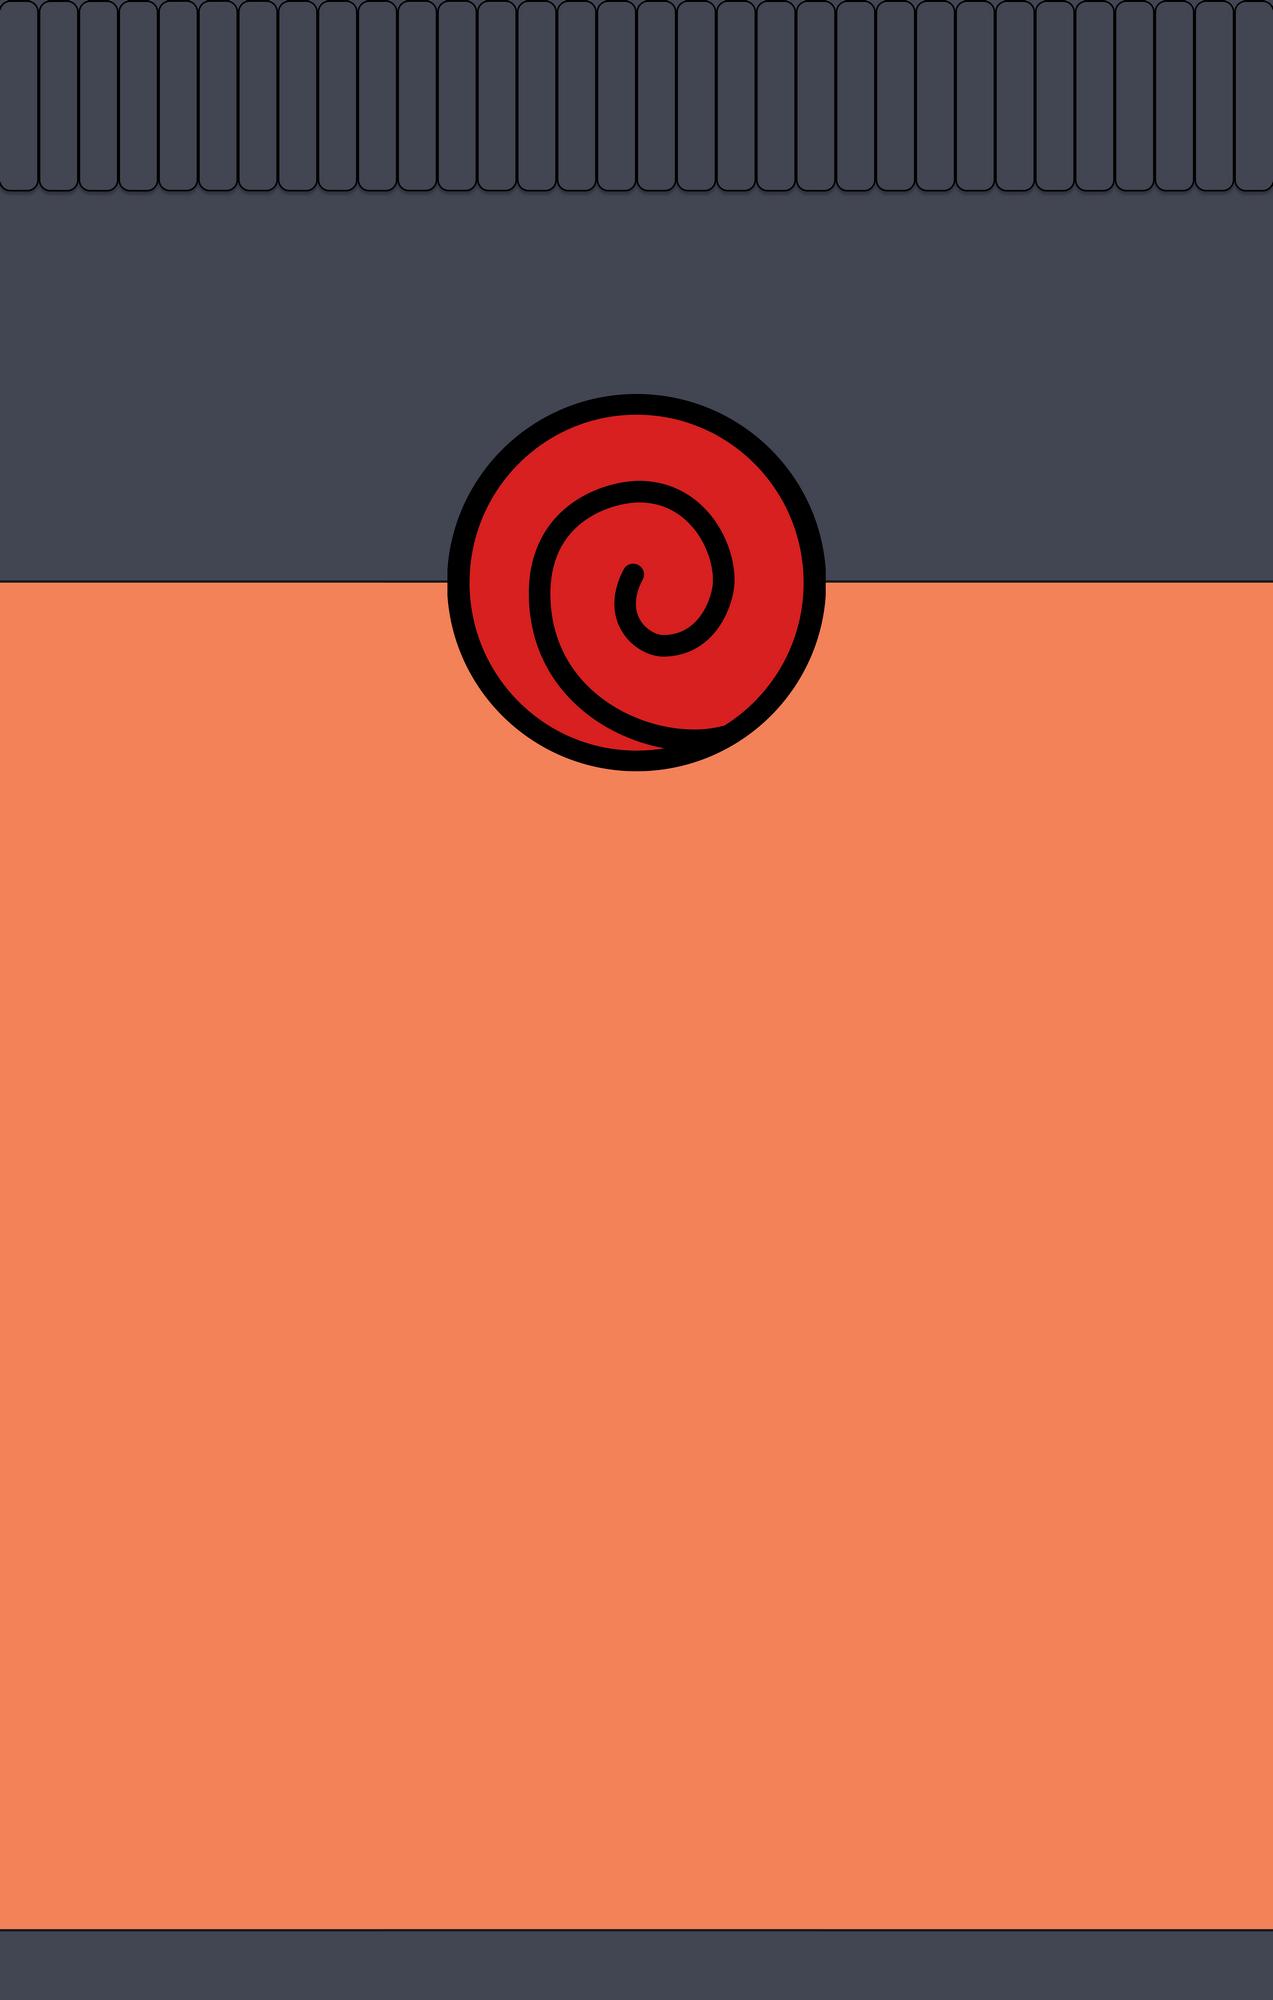 Naruto jacket texture - Back by Labtecs937 on DeviantArt